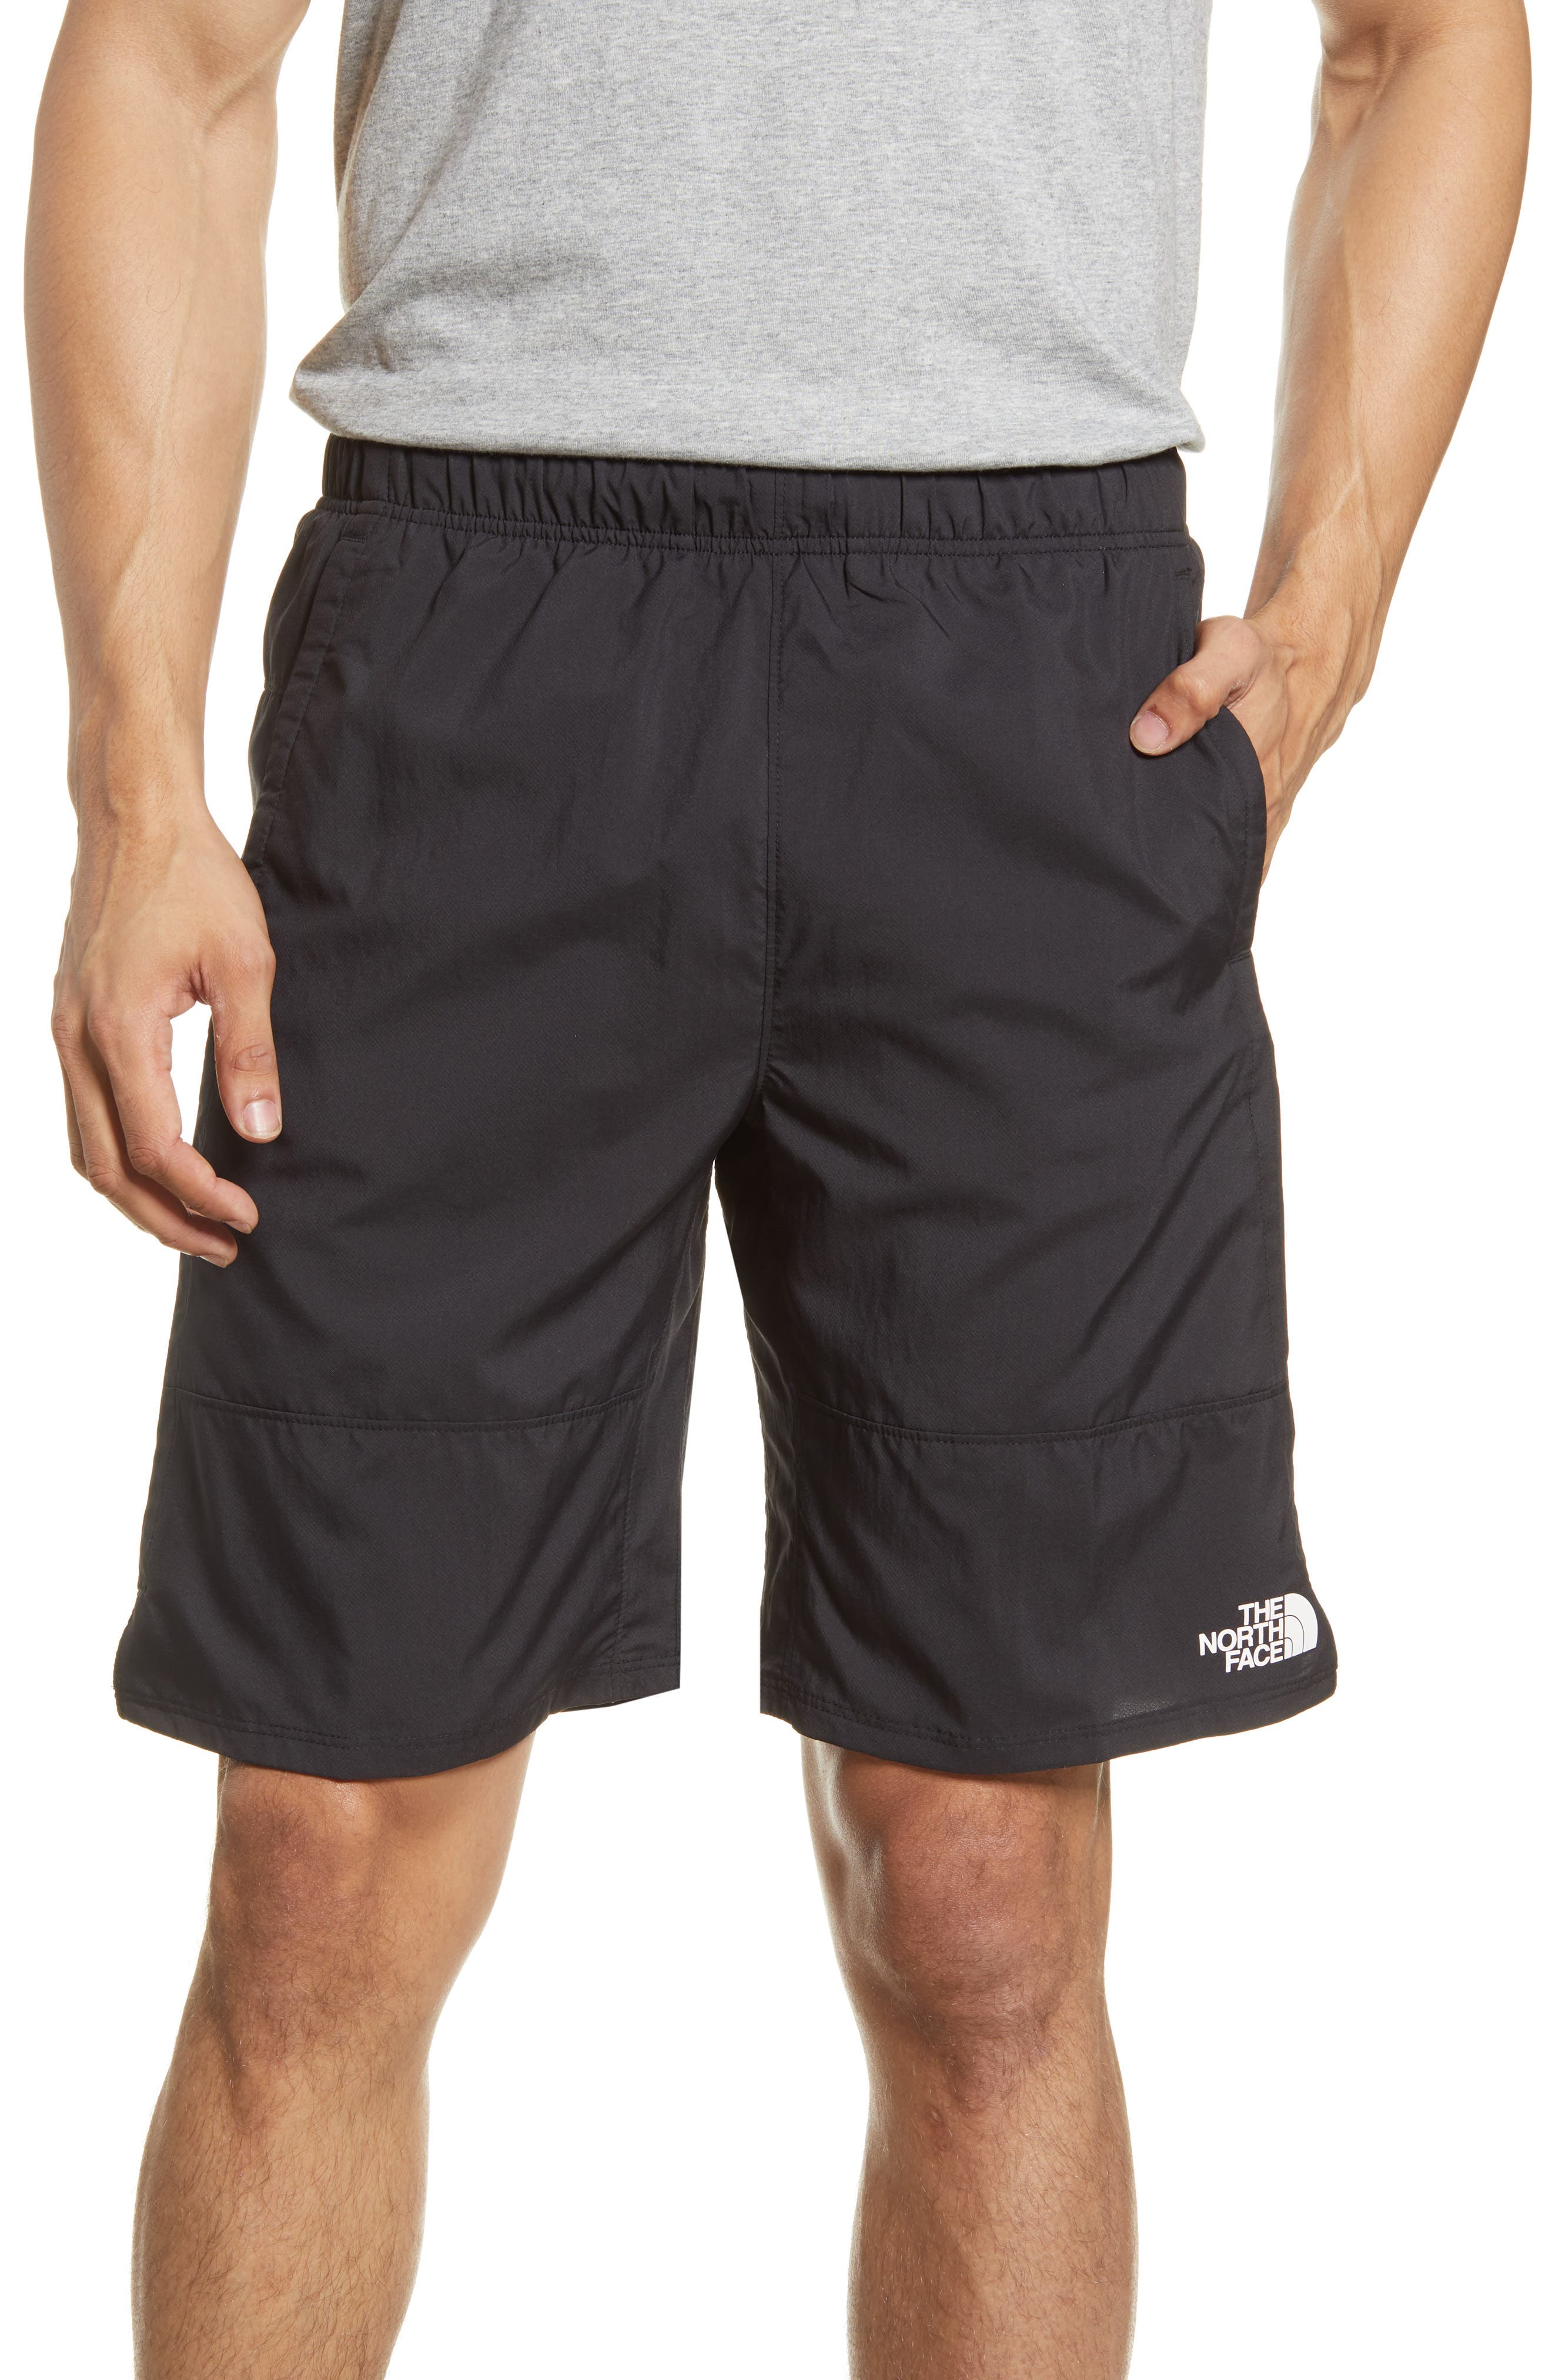 Horizon-t Beach Shorts Dog Paw Prints Mens Fashion Quick Dry Beach Shorts Cool Casual Beach Shorts